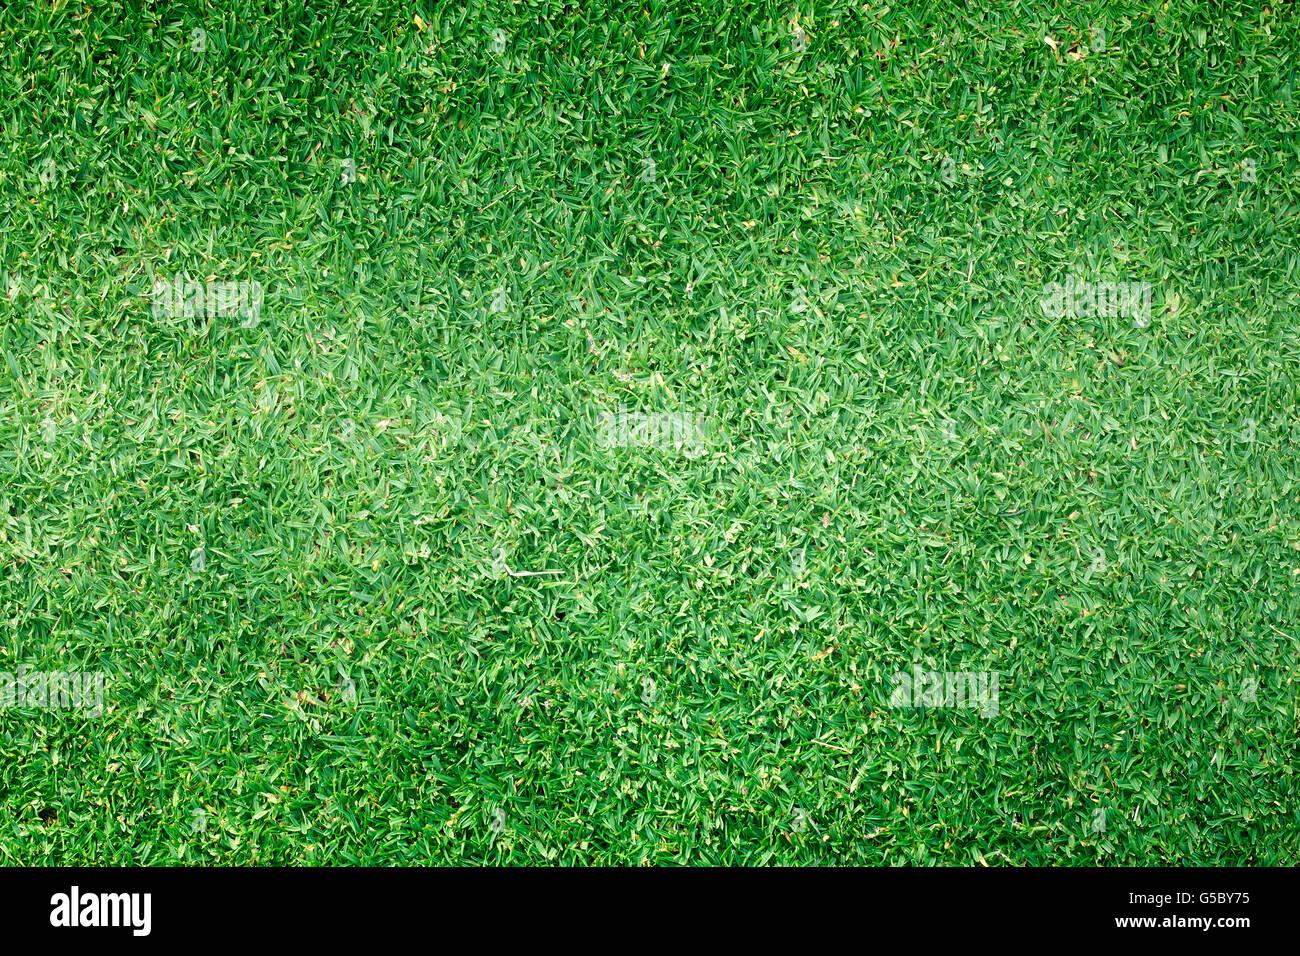 Golfplätze grünen Rasen Muster strukturierten Hintergrund. Stockfoto